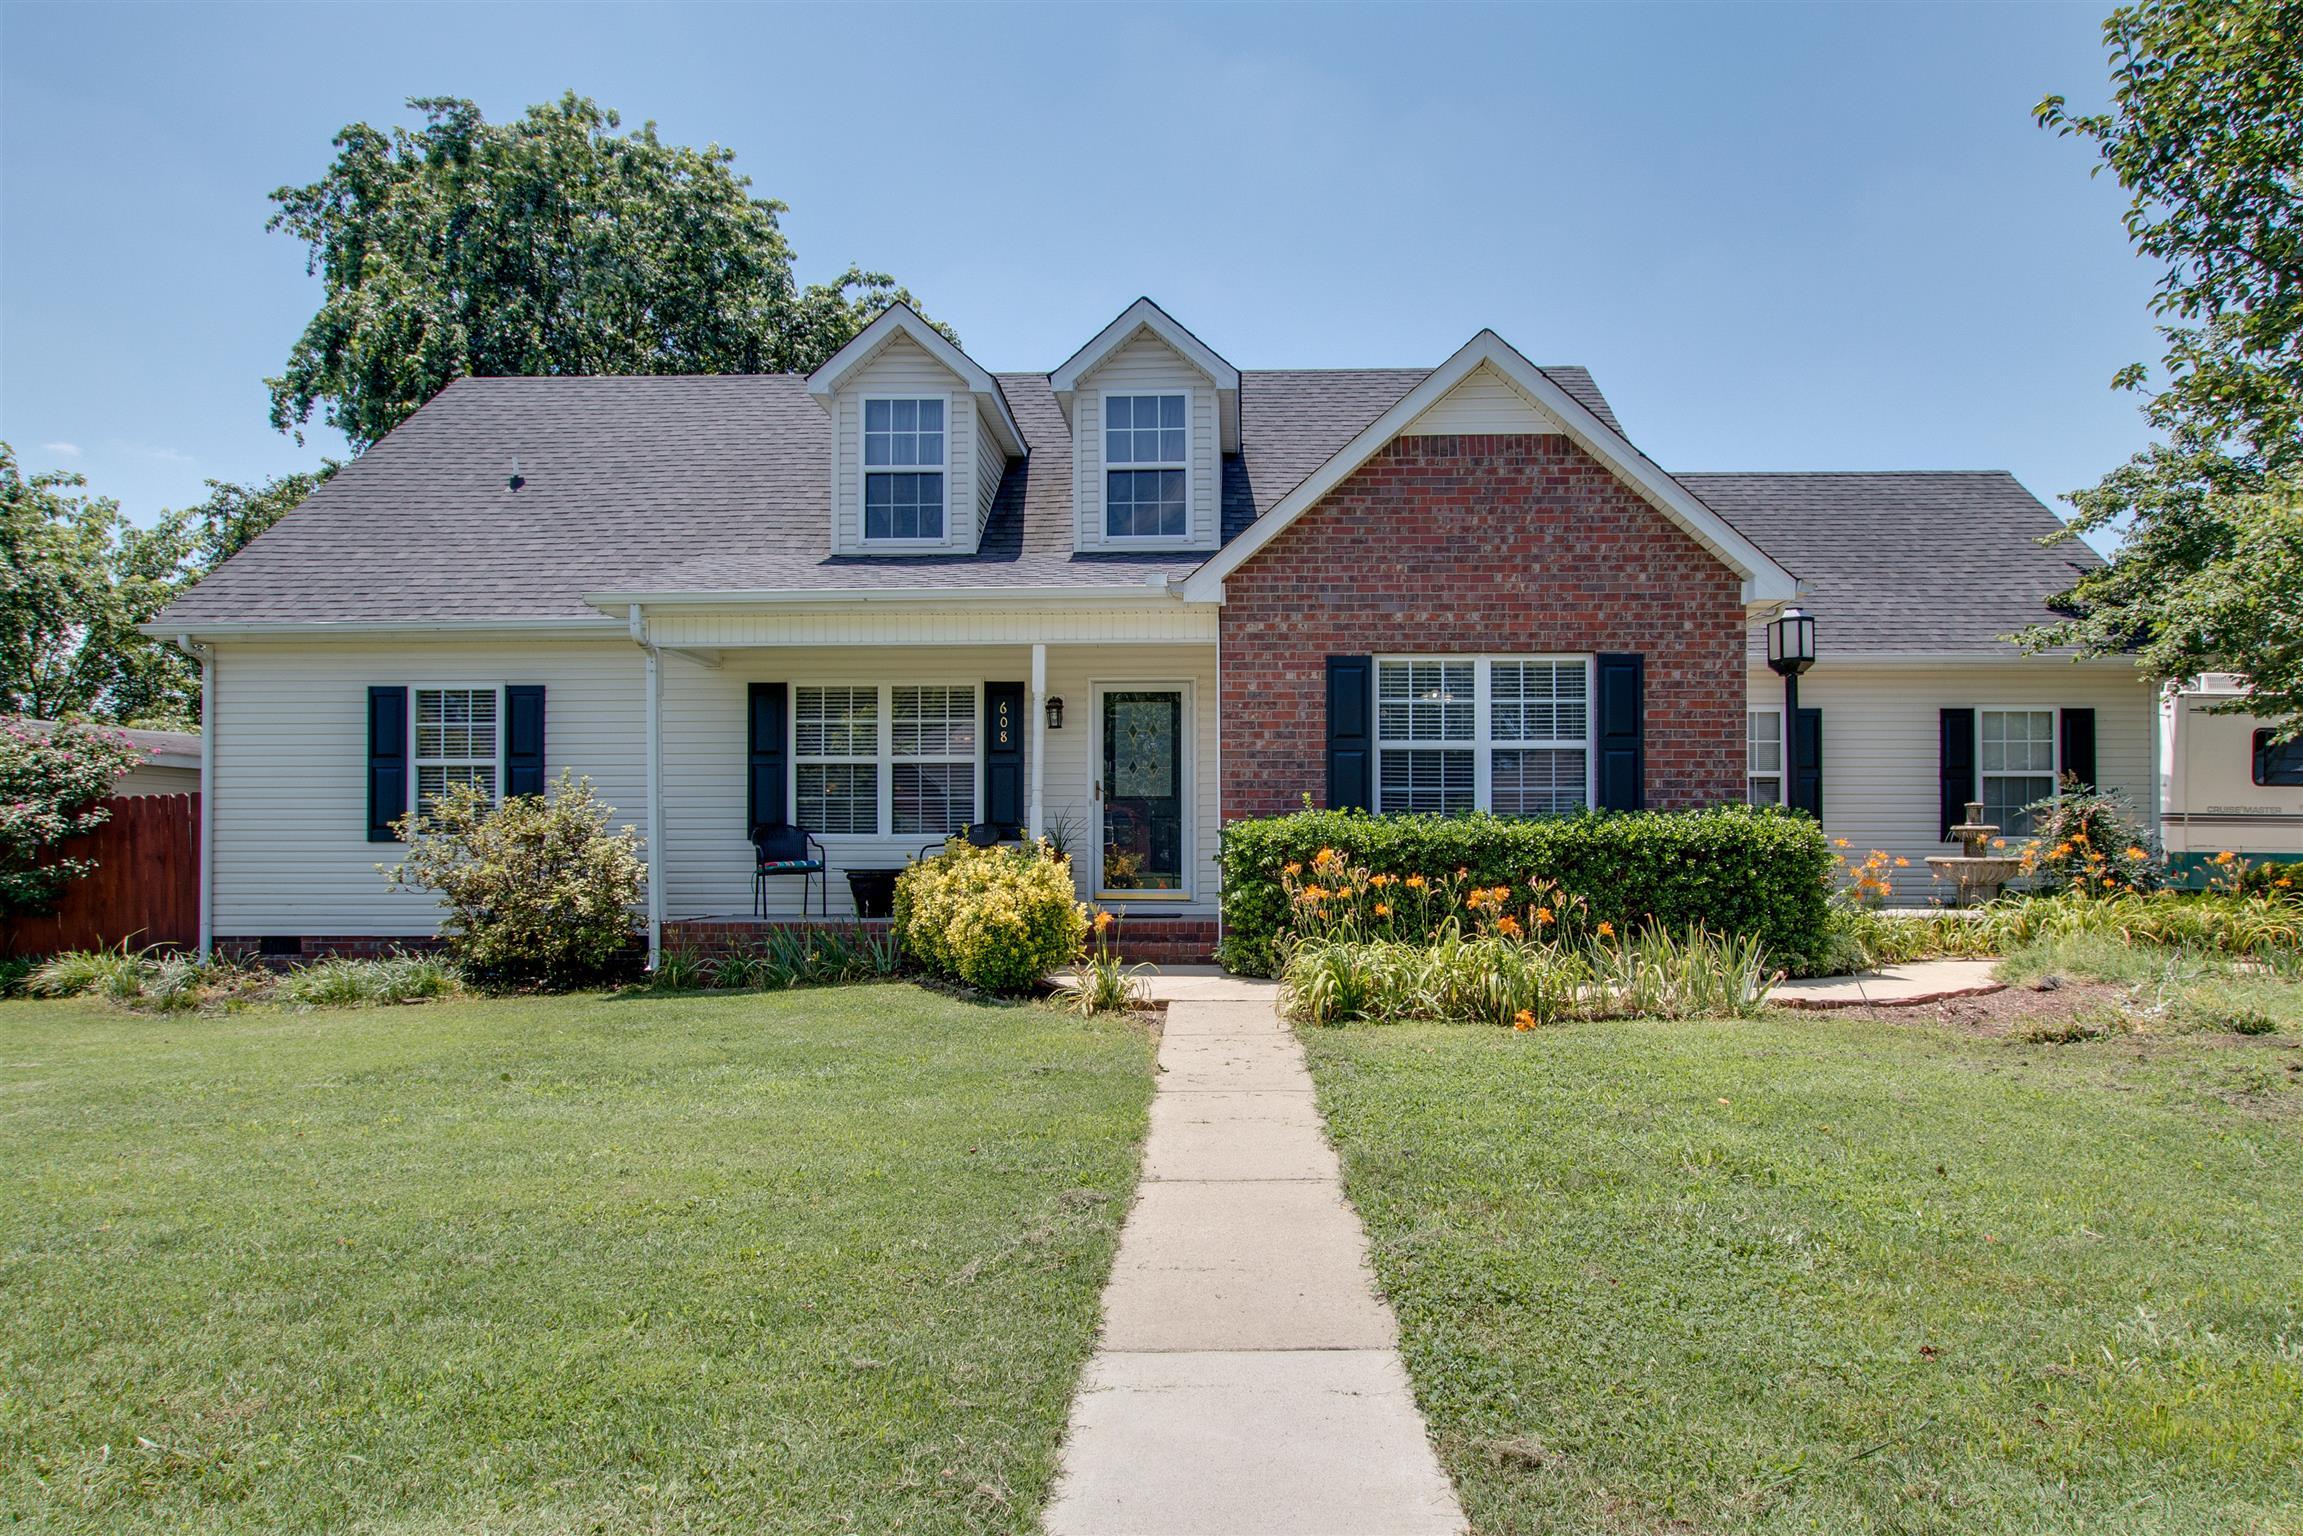 608 Joe B Jackson Pkwy, Murfreesboro, TN 37127 - Murfreesboro, TN real estate listing